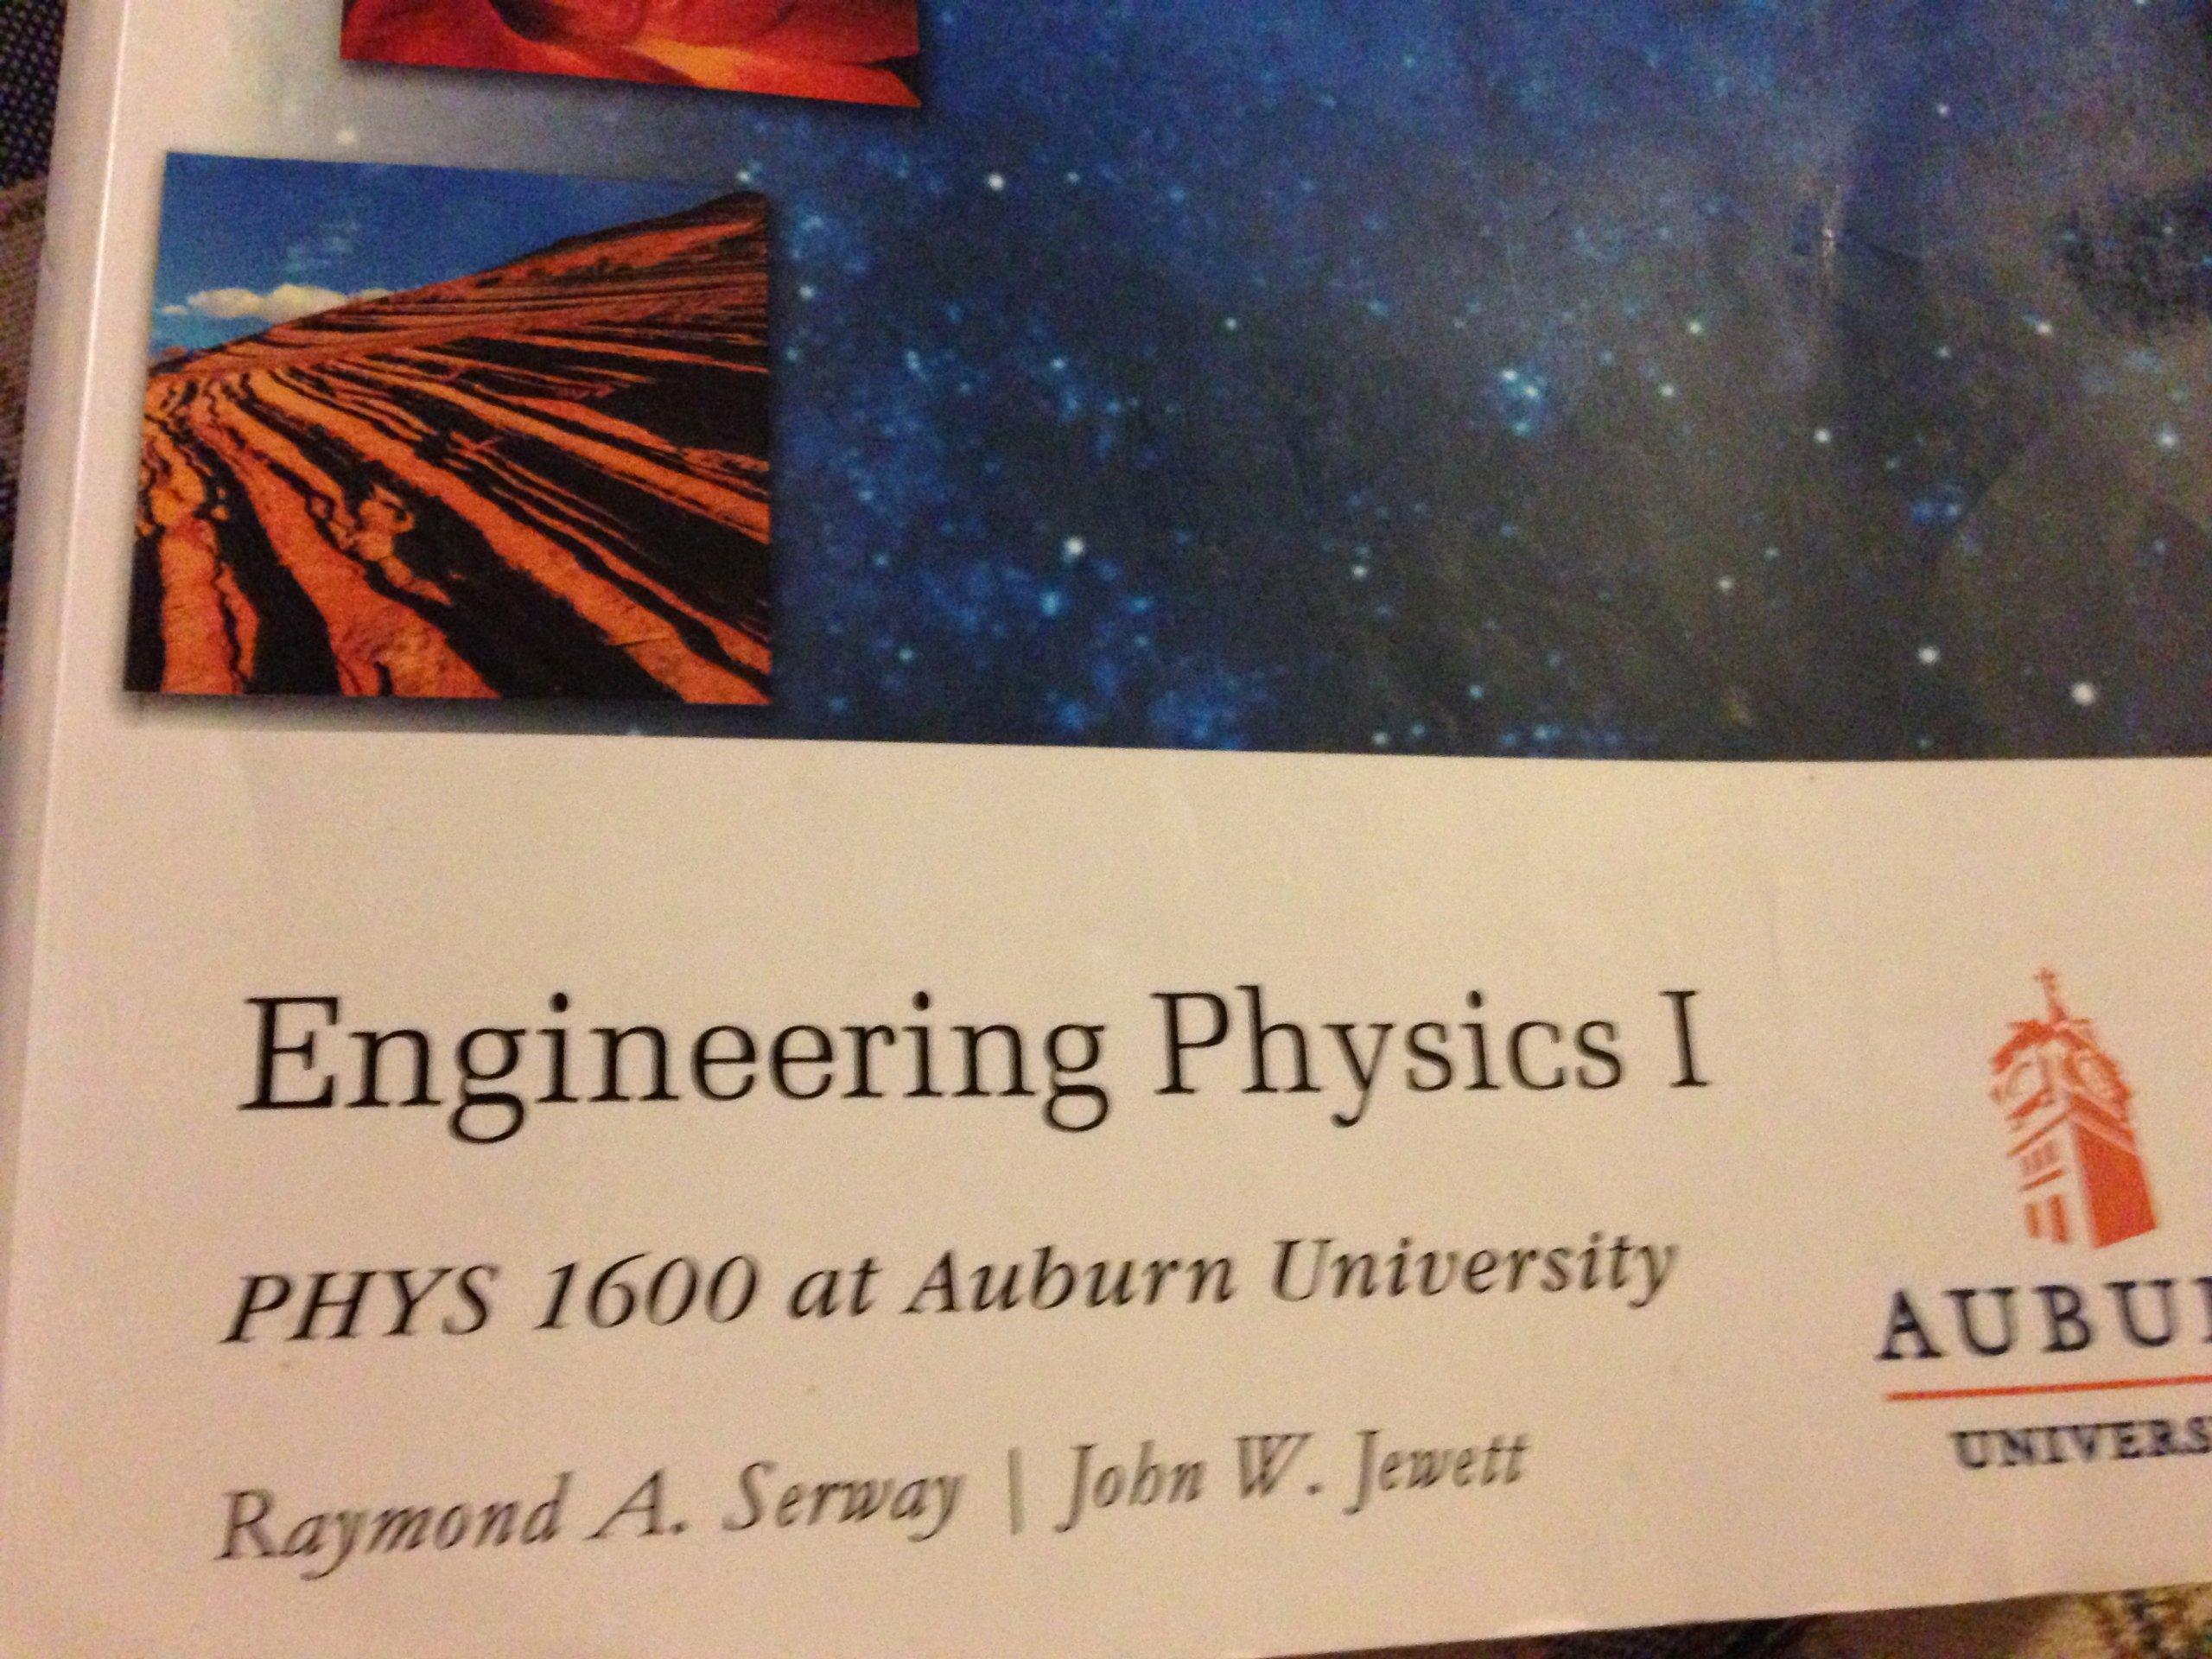 engineering-physics-i-phys-1600-at-auburn-universi